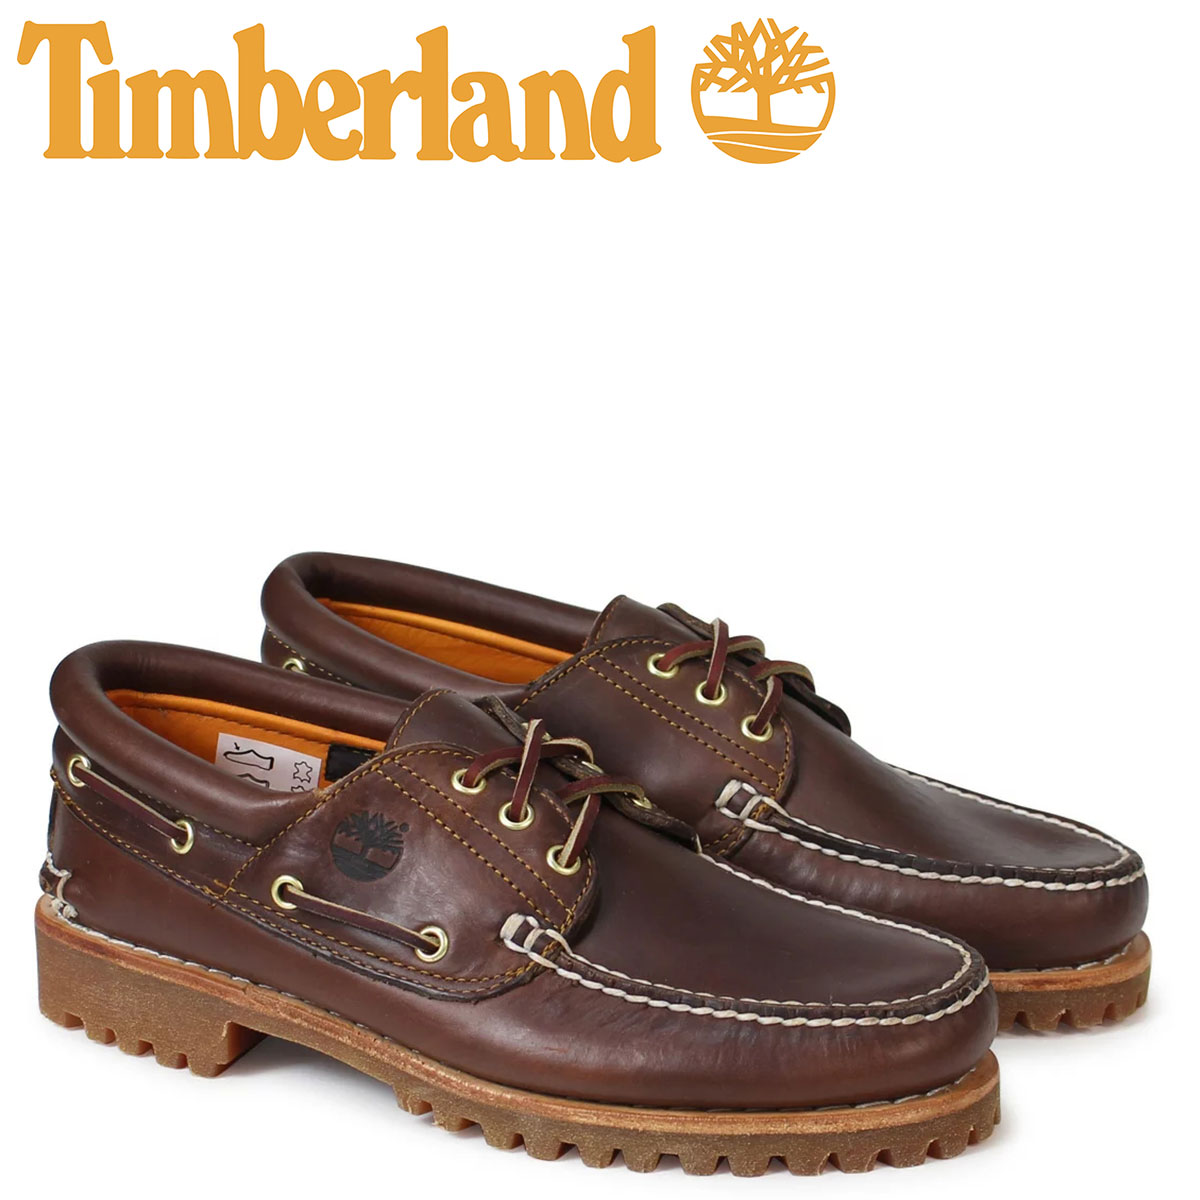 Timberland HERITAGE 3 EYE CLASSIC LUG 30003 ティンバーランド デッキシューズ メンズ